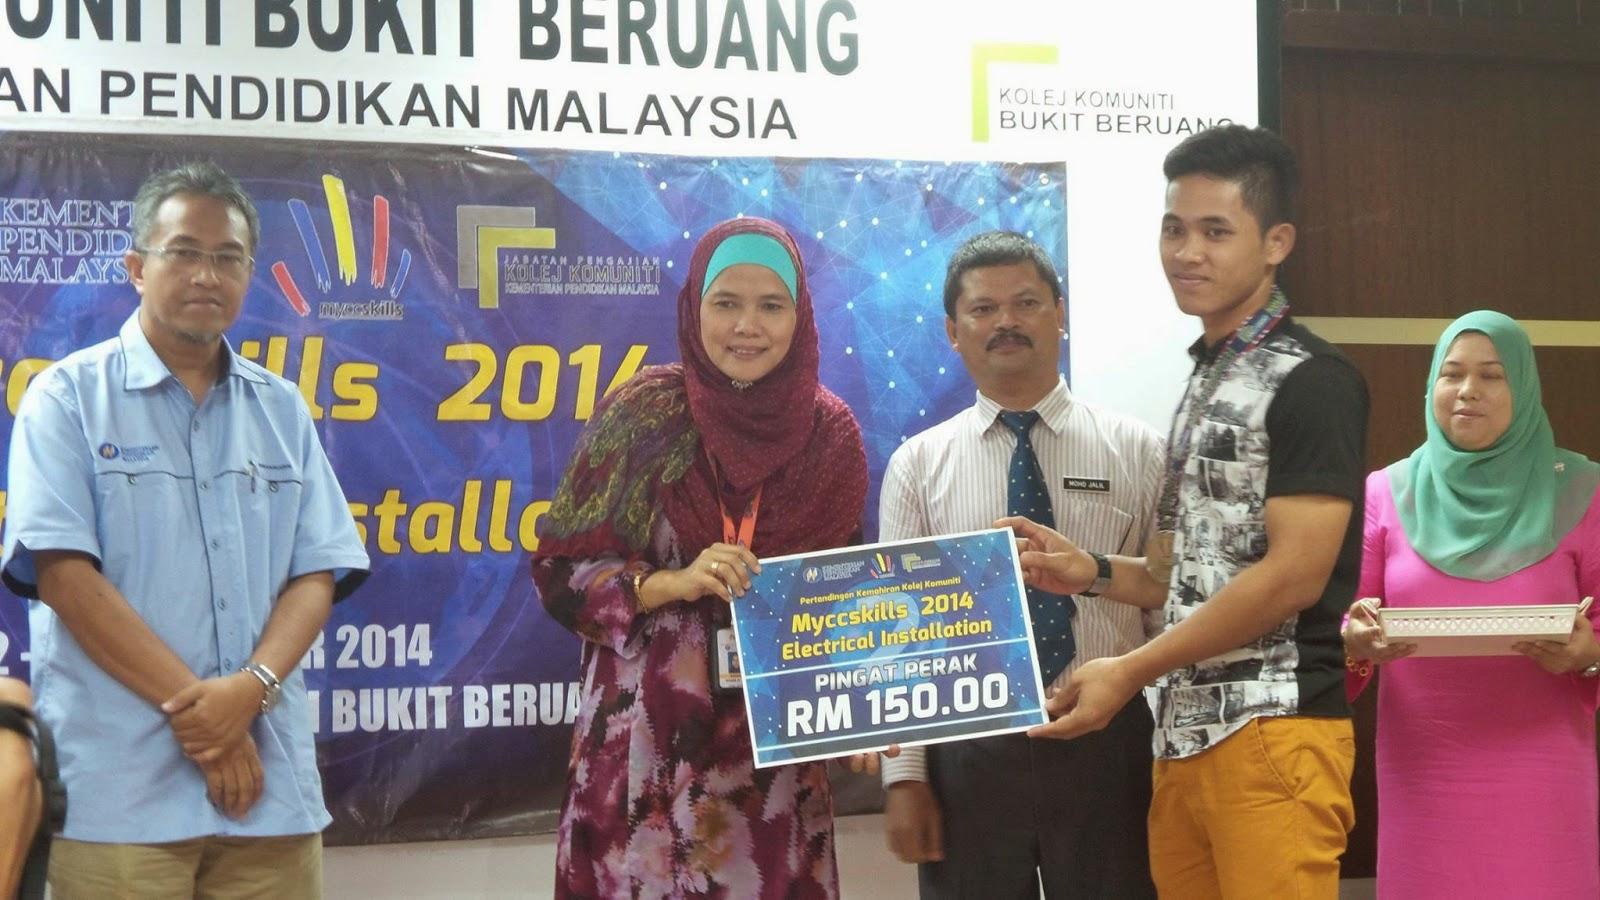 Kolej Komuniti Kuala Langat Jadual Waktu Kolej Komuniti Kuala Langat